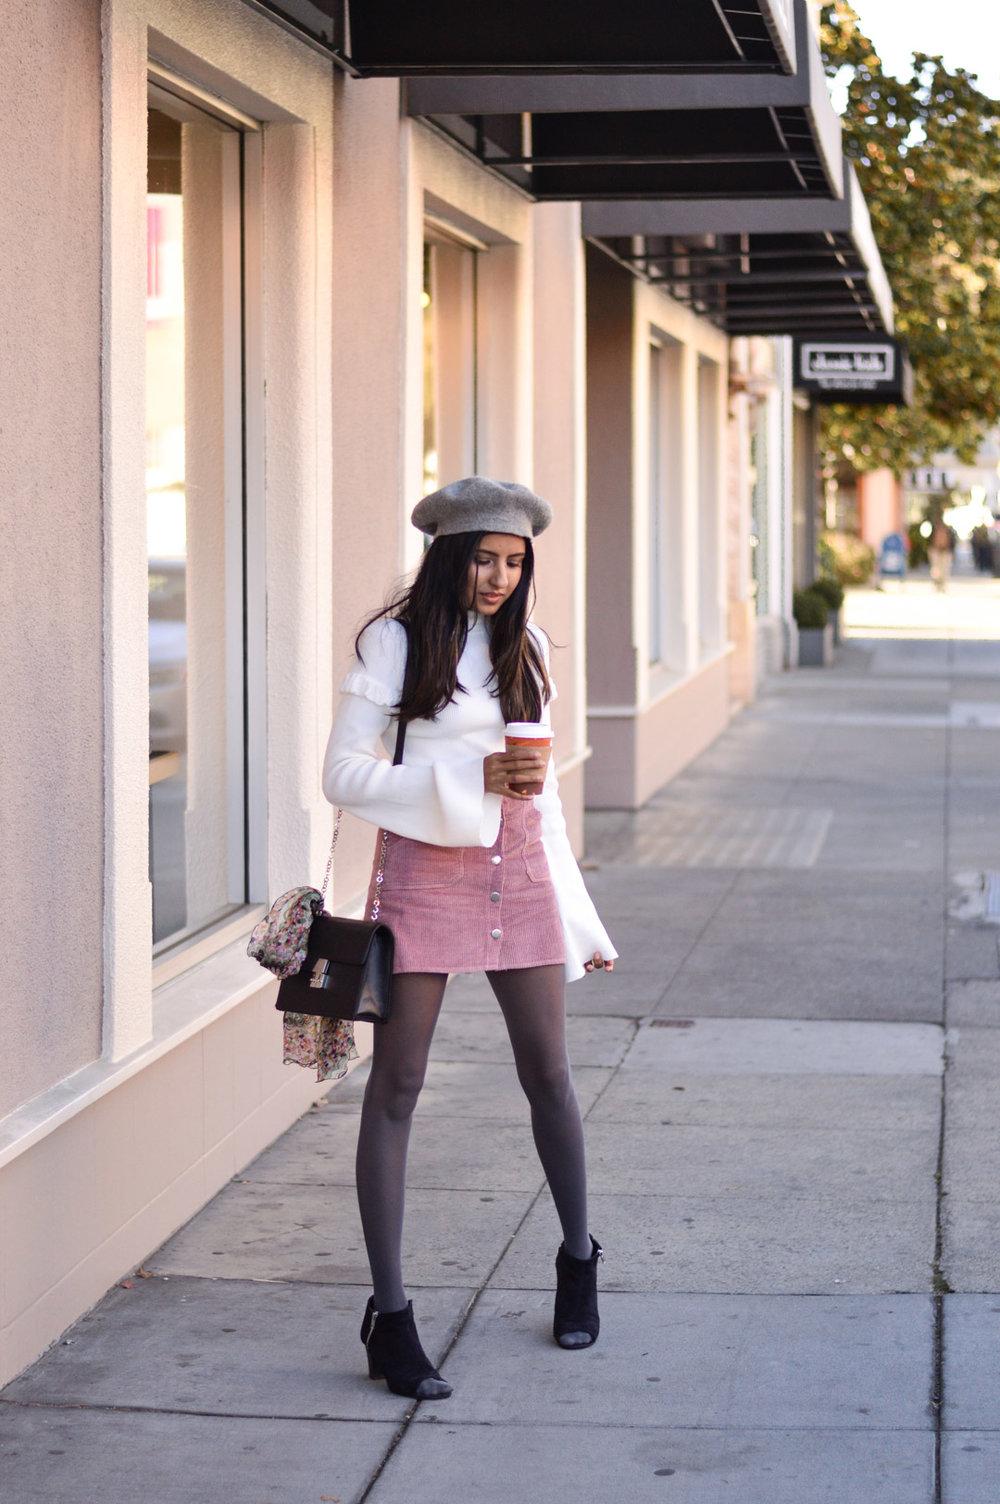 corduroy-skirt-pink-beret-fall-style 1